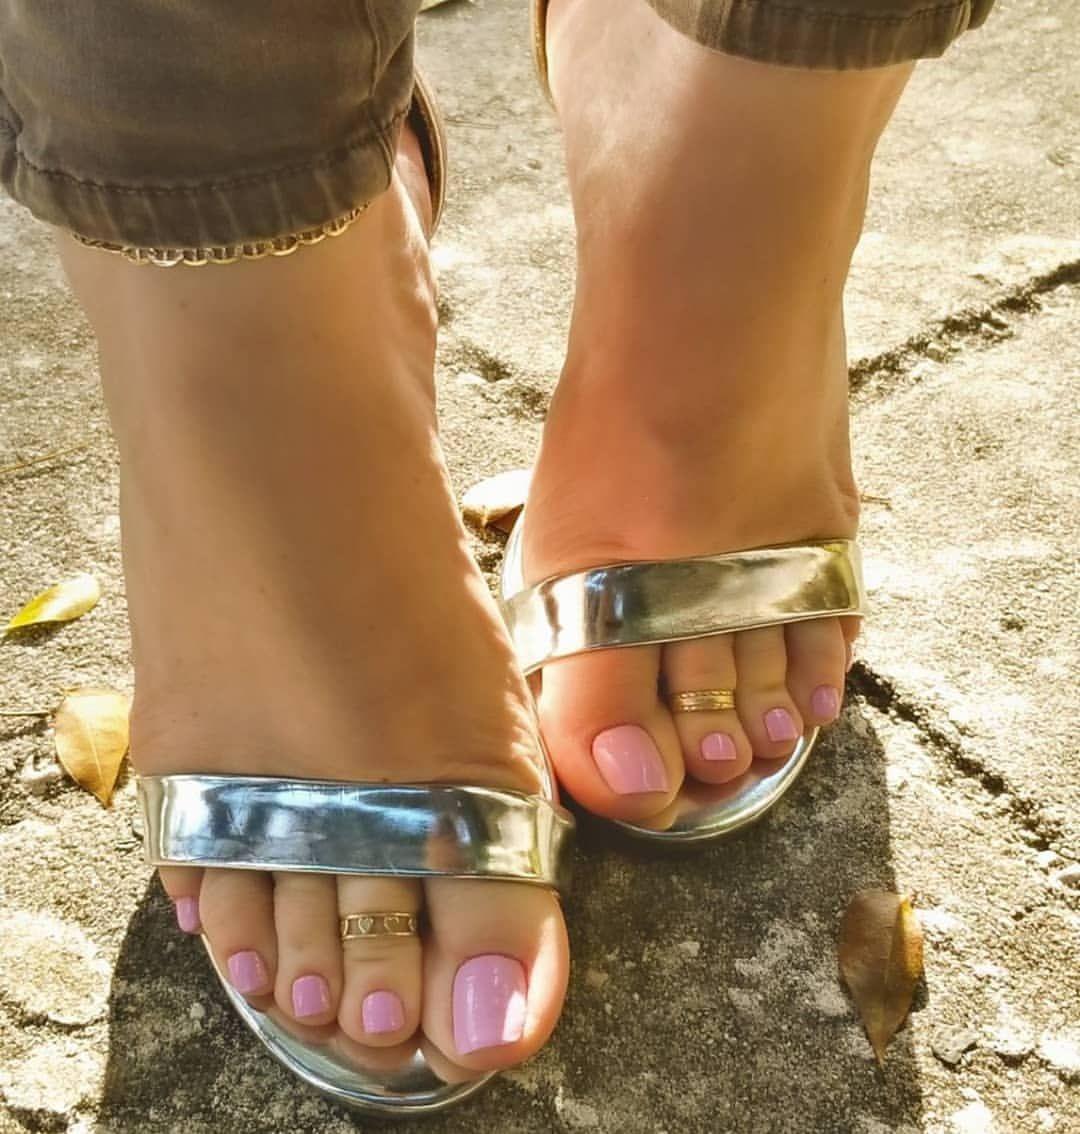 Foot fetish jewelry